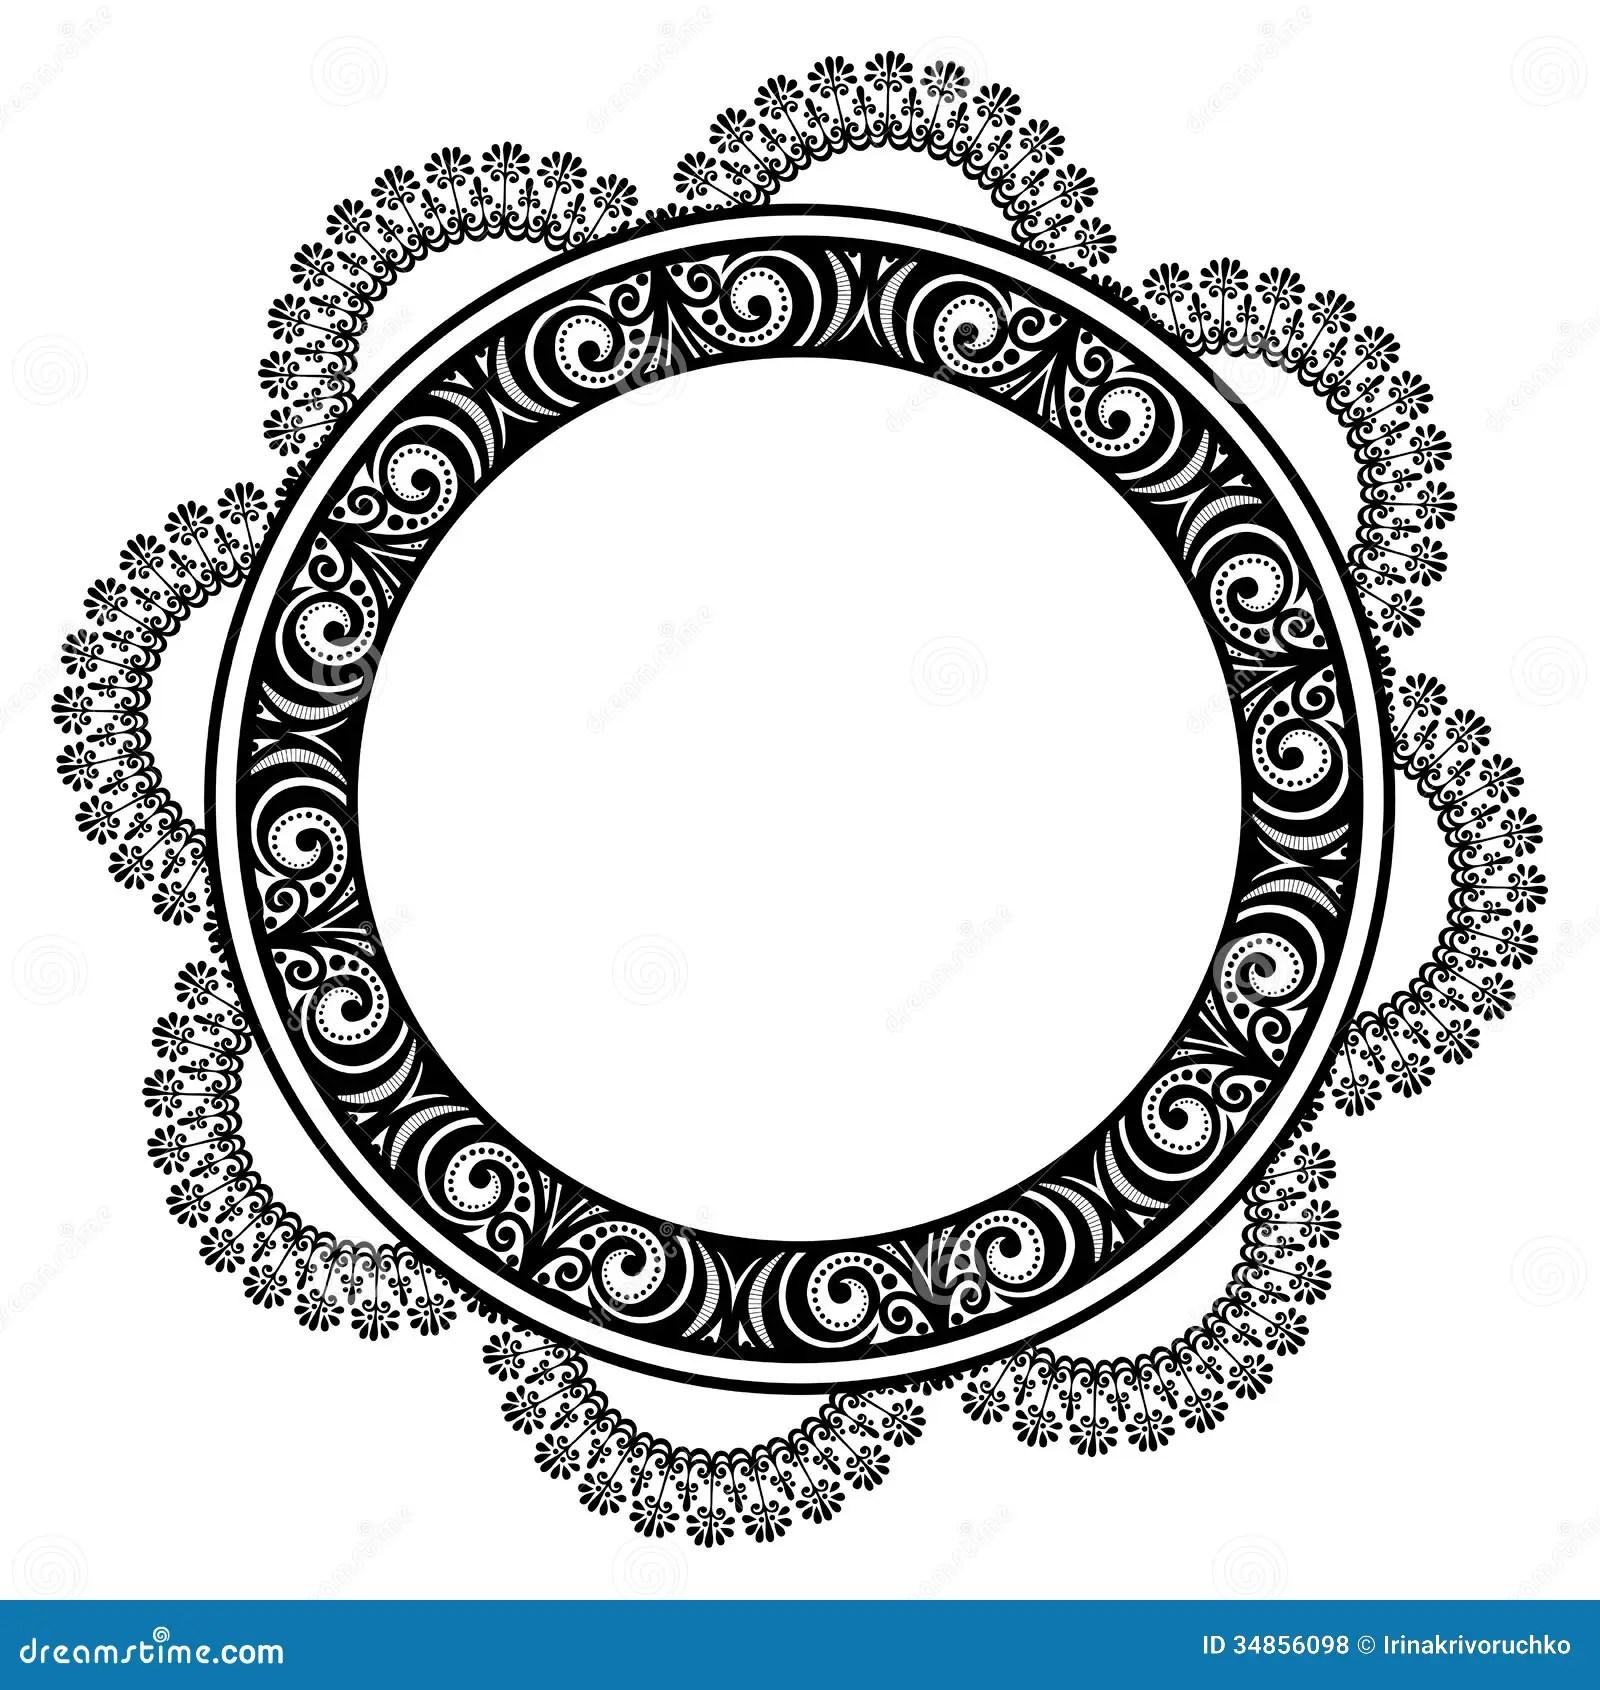 Decorative Round Frame Royalty Free Stock Photos